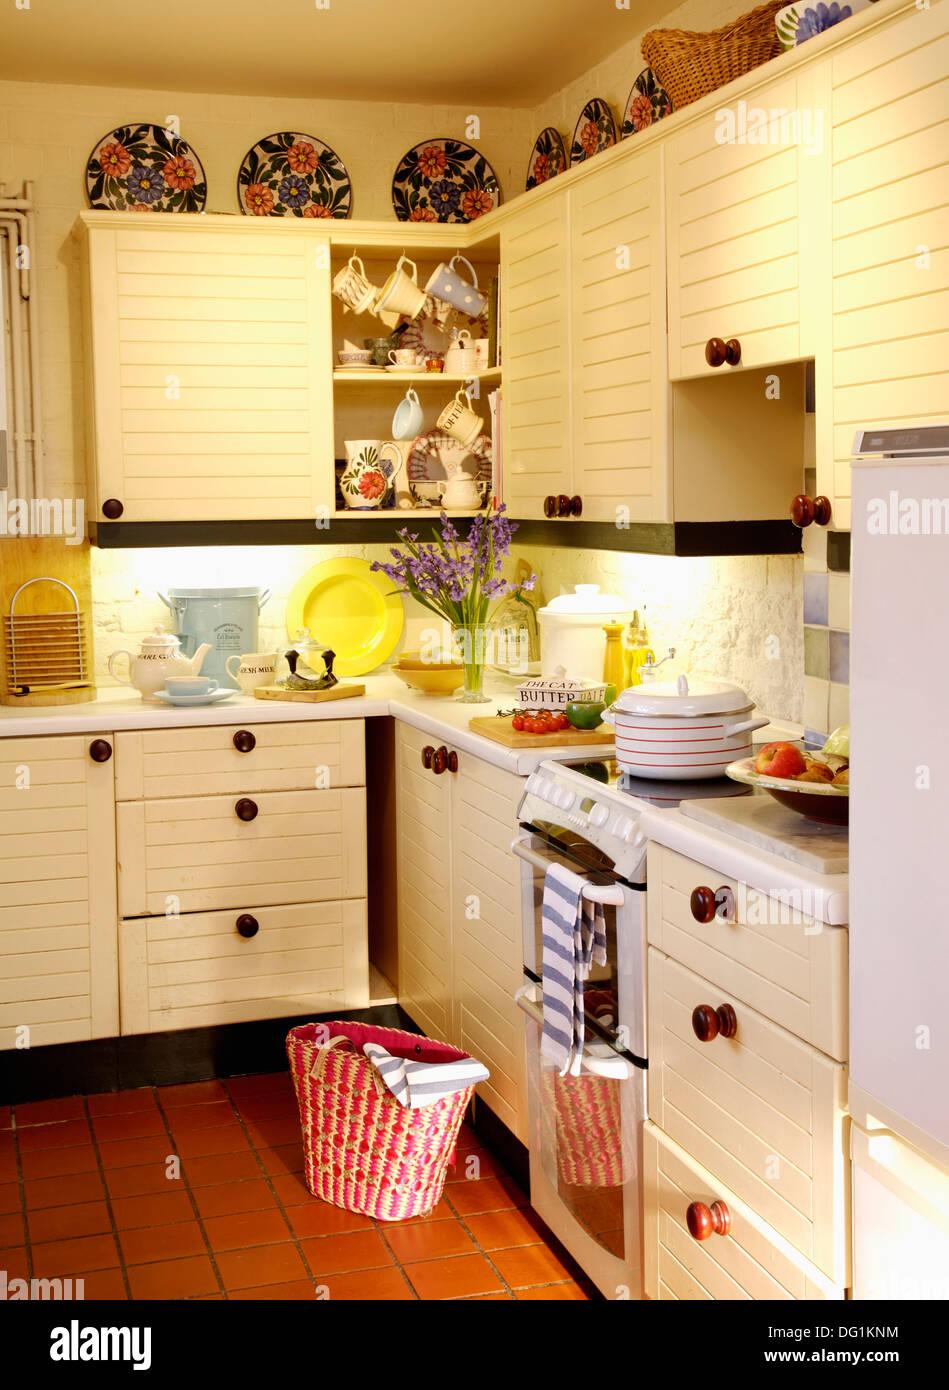 Terracotta Kitchen Floor Cream Cottage Kitchen With Red Basket On Terracotta Tiled Floor